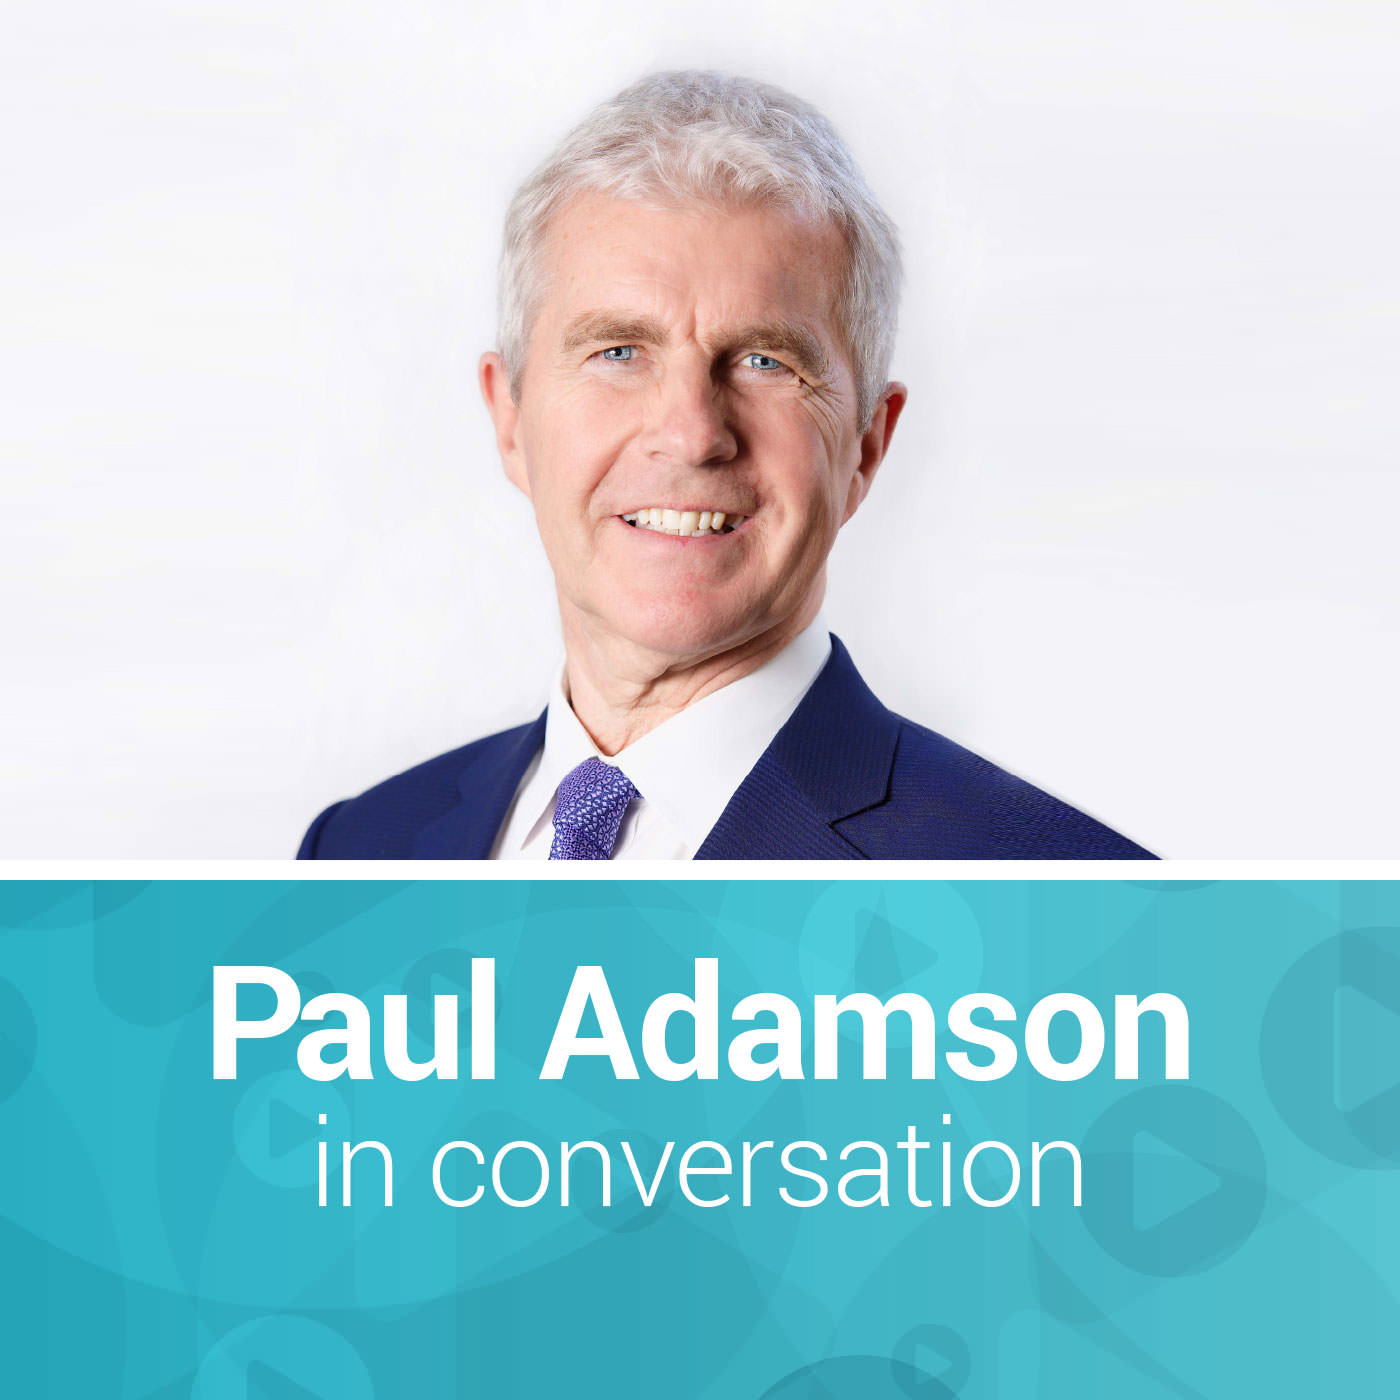 paul adamson in conversation by paul adamson on apple podcasts